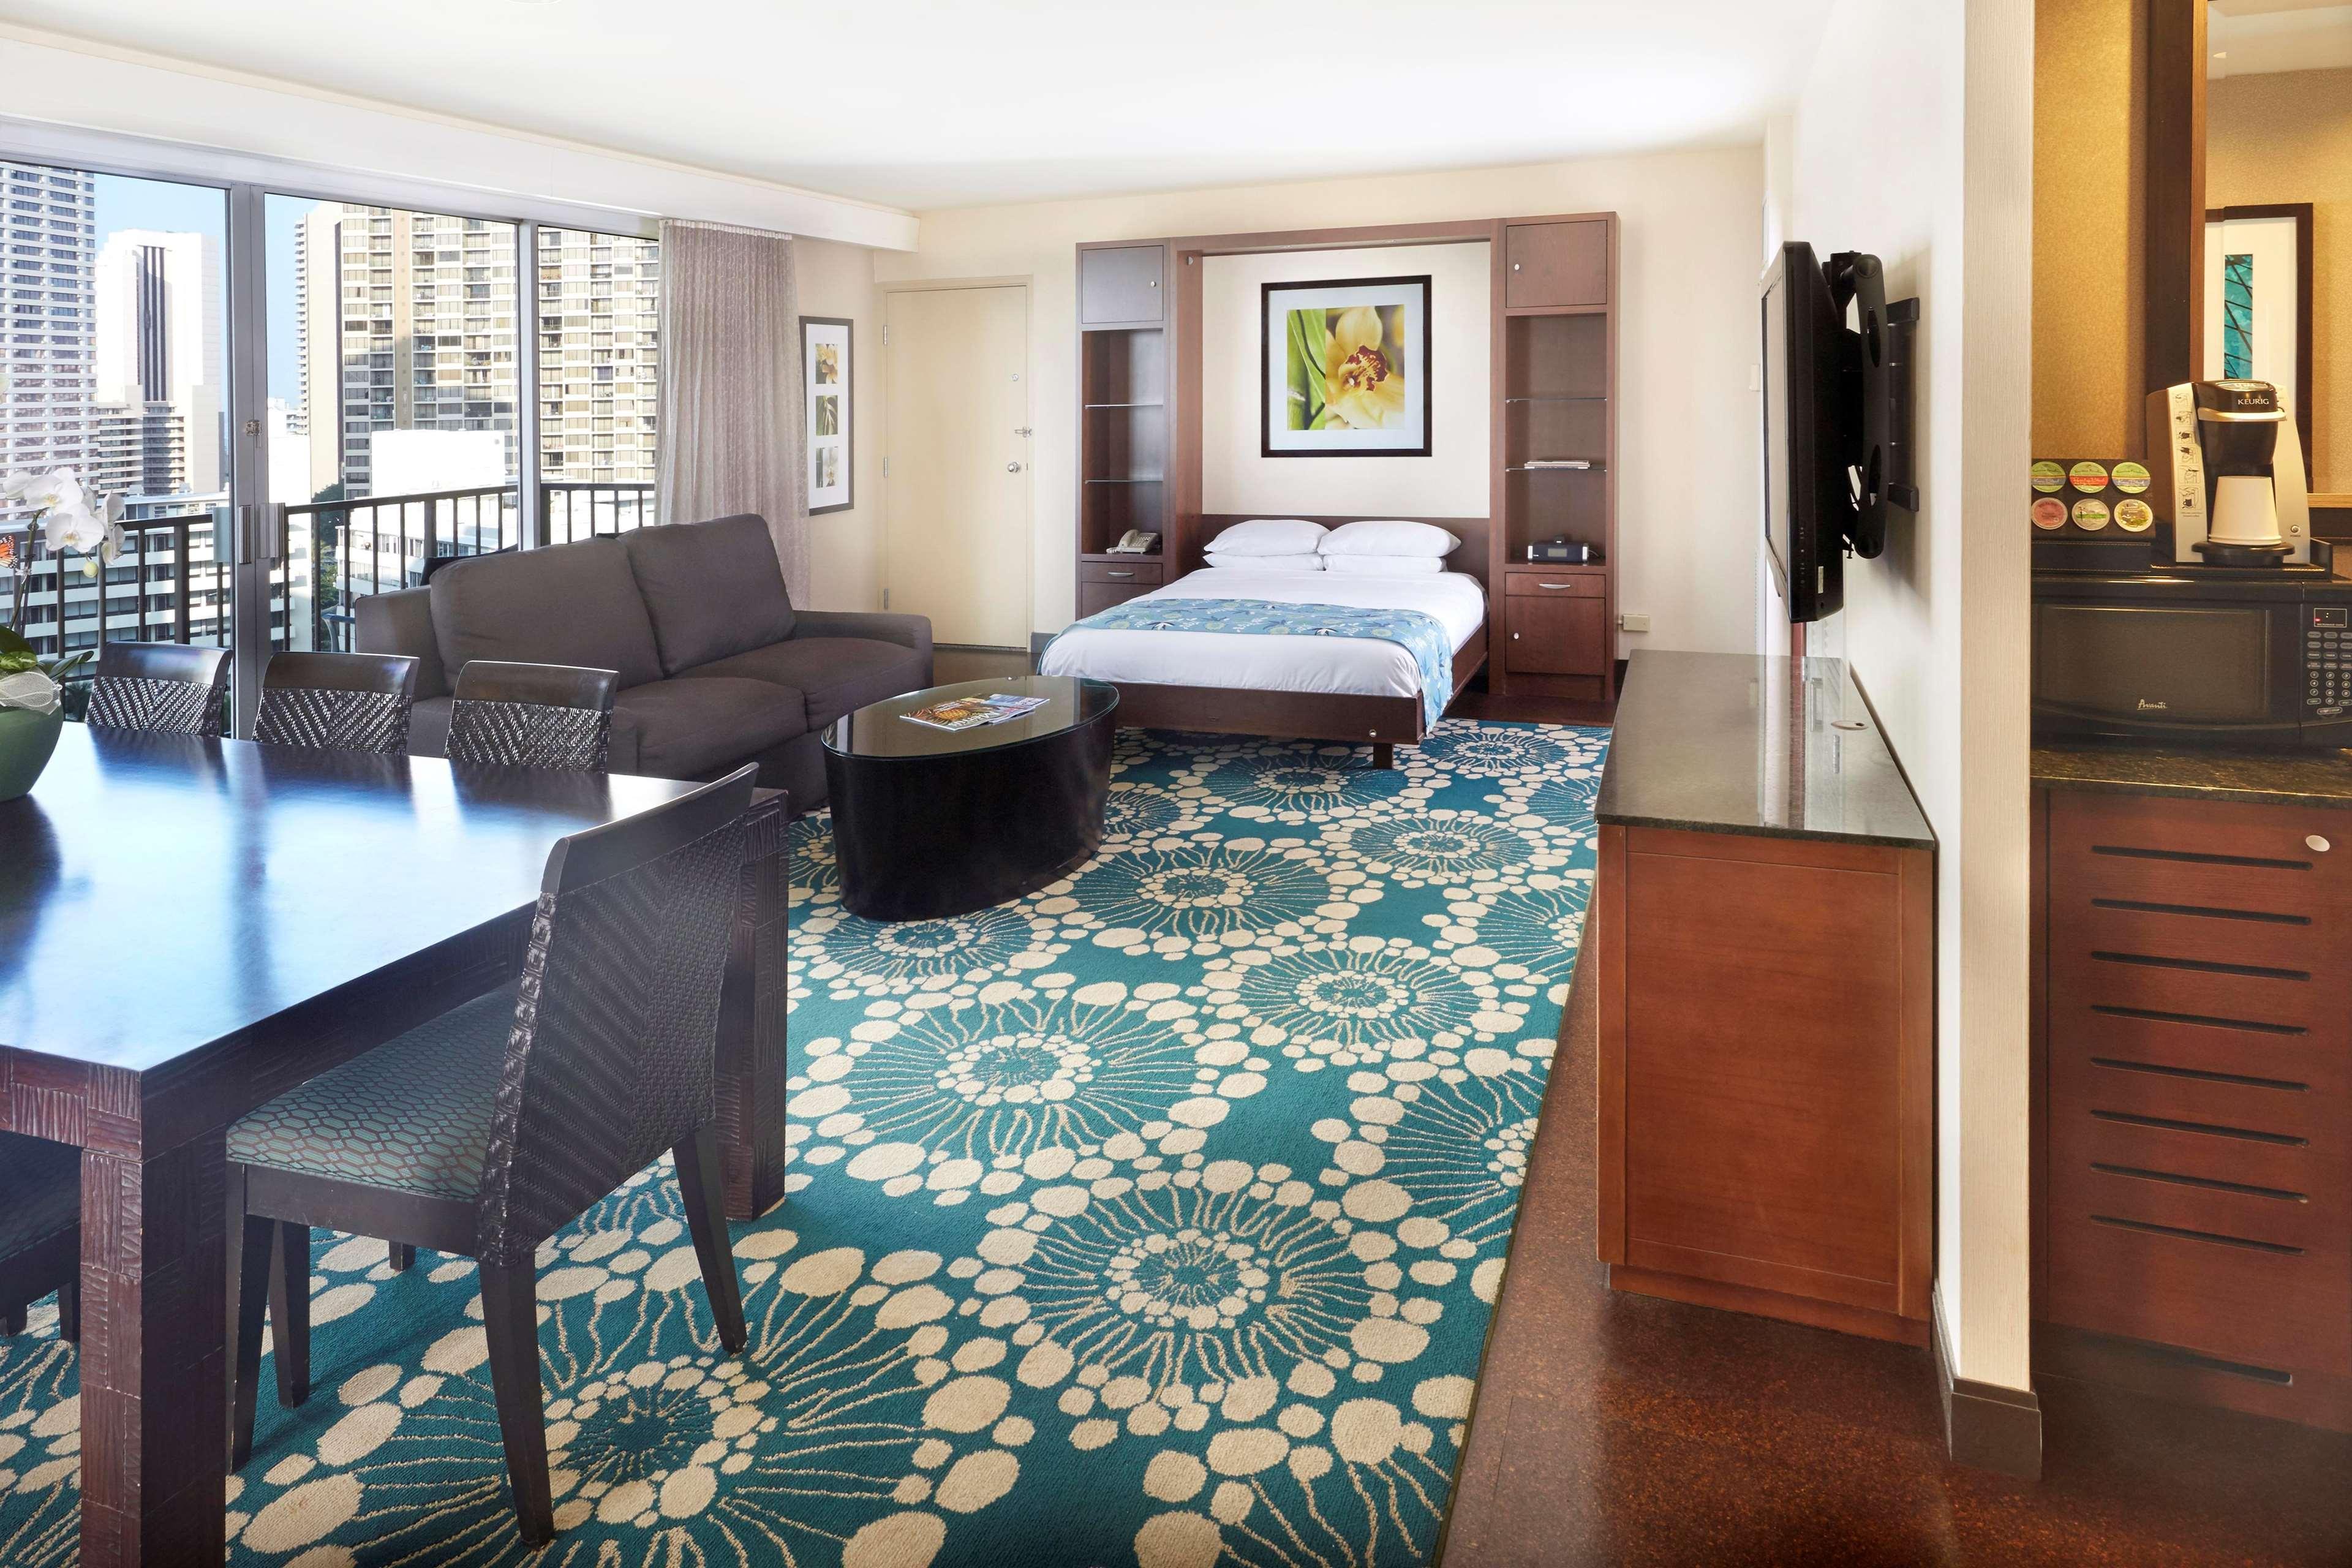 DoubleTree by Hilton Hotel Alana - Waikiki Beach image 27